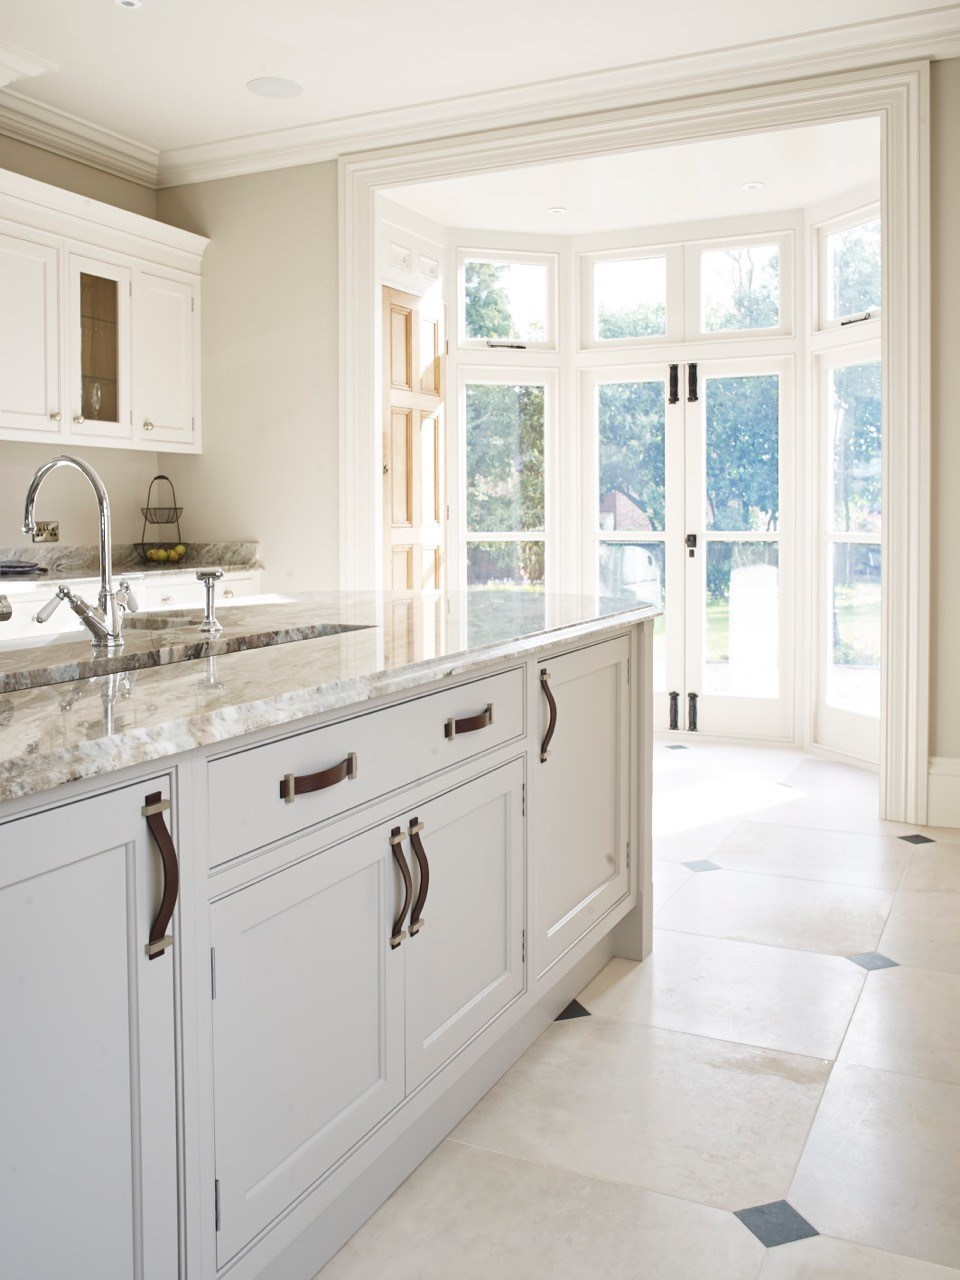 Matt kitchen 1.jpg